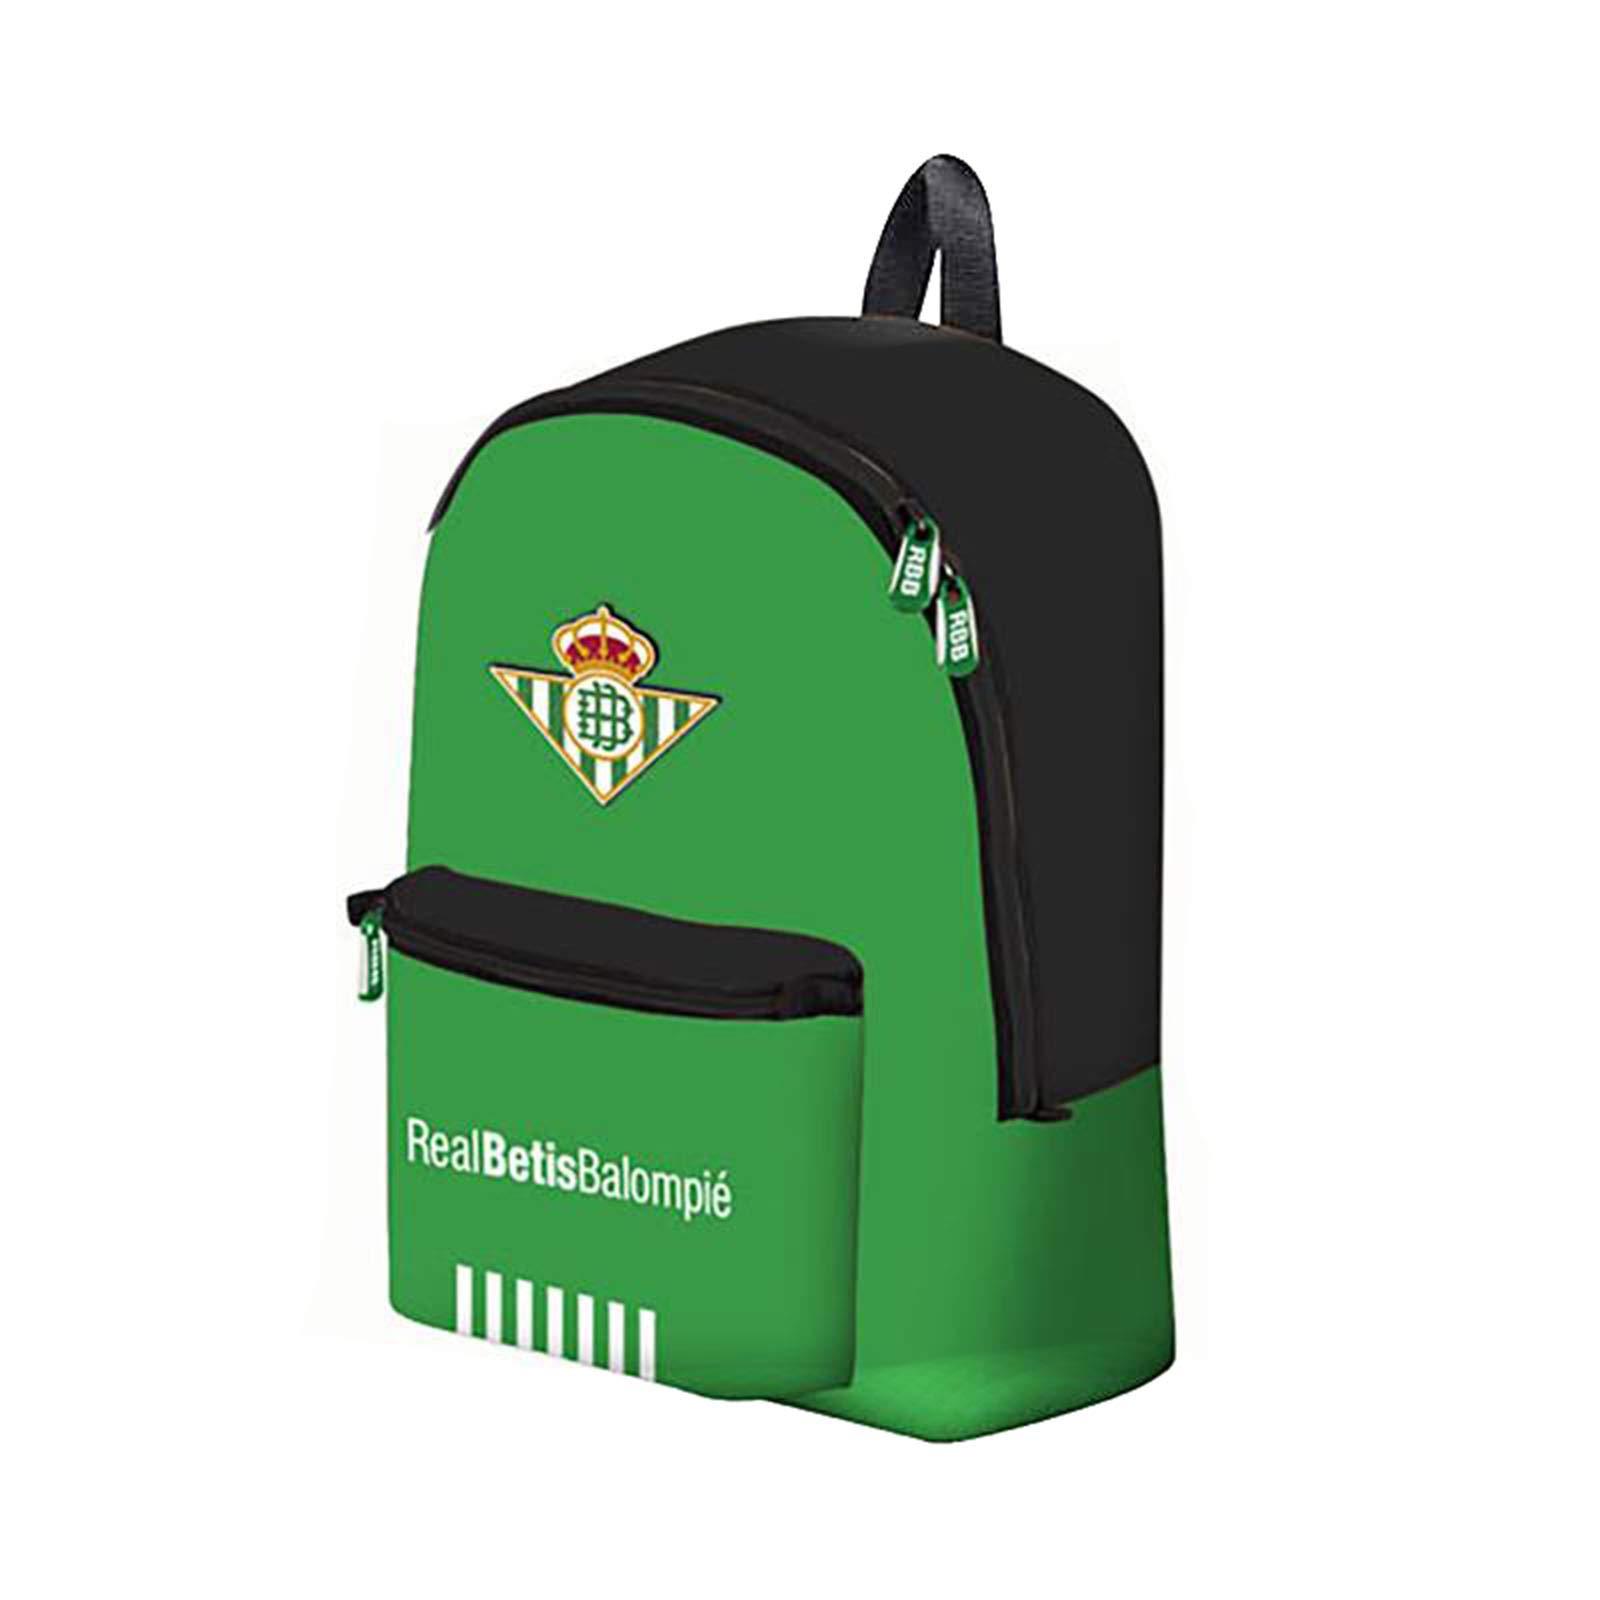 Mochila Grande Real Betis 2018/2019 Double Zipp. Medidas: 36X16X42CM: Amazon.es: Libros